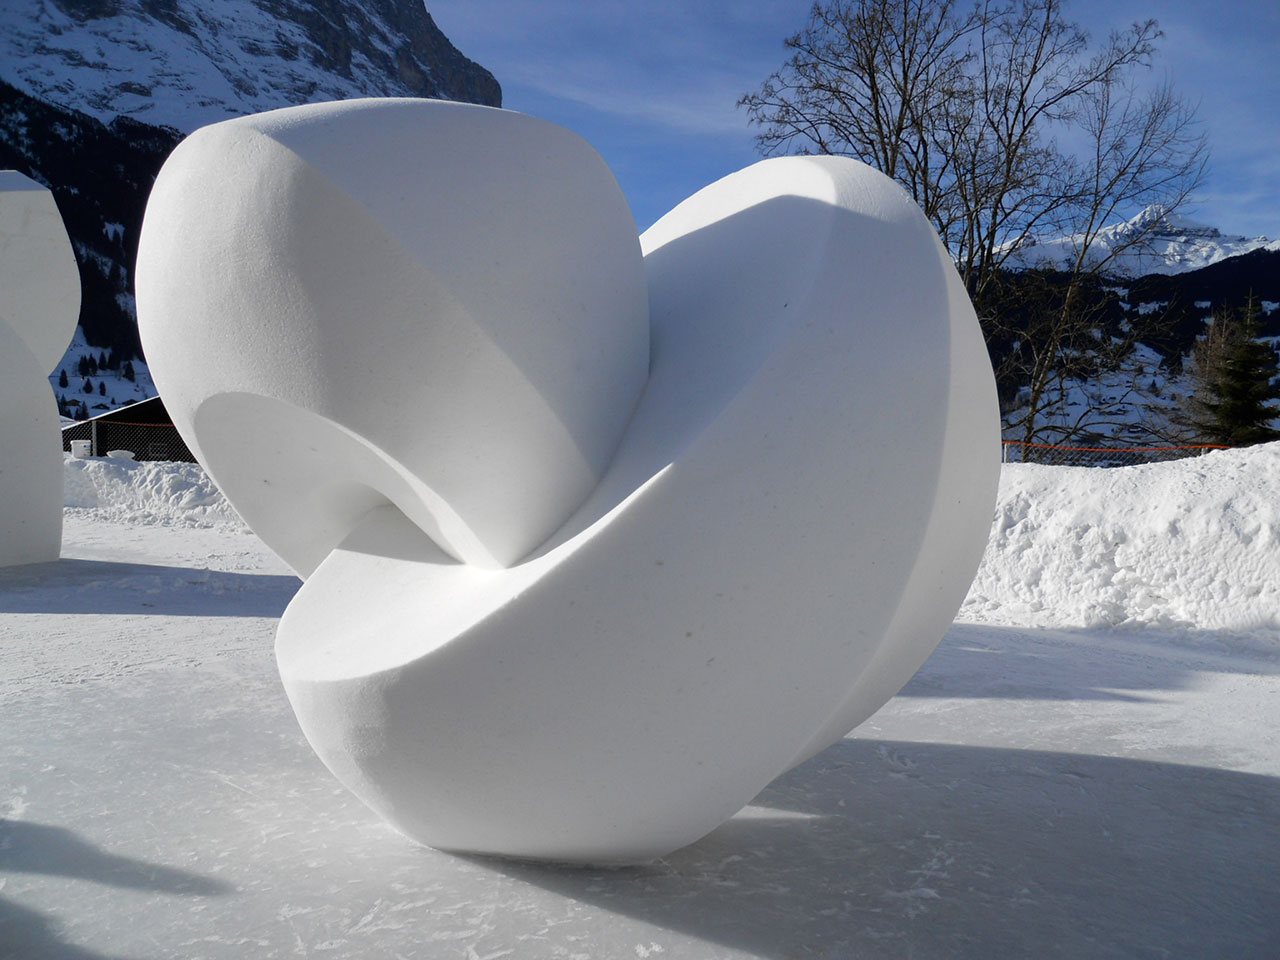 world snow festival Grindelwald-2010-yvonne moser